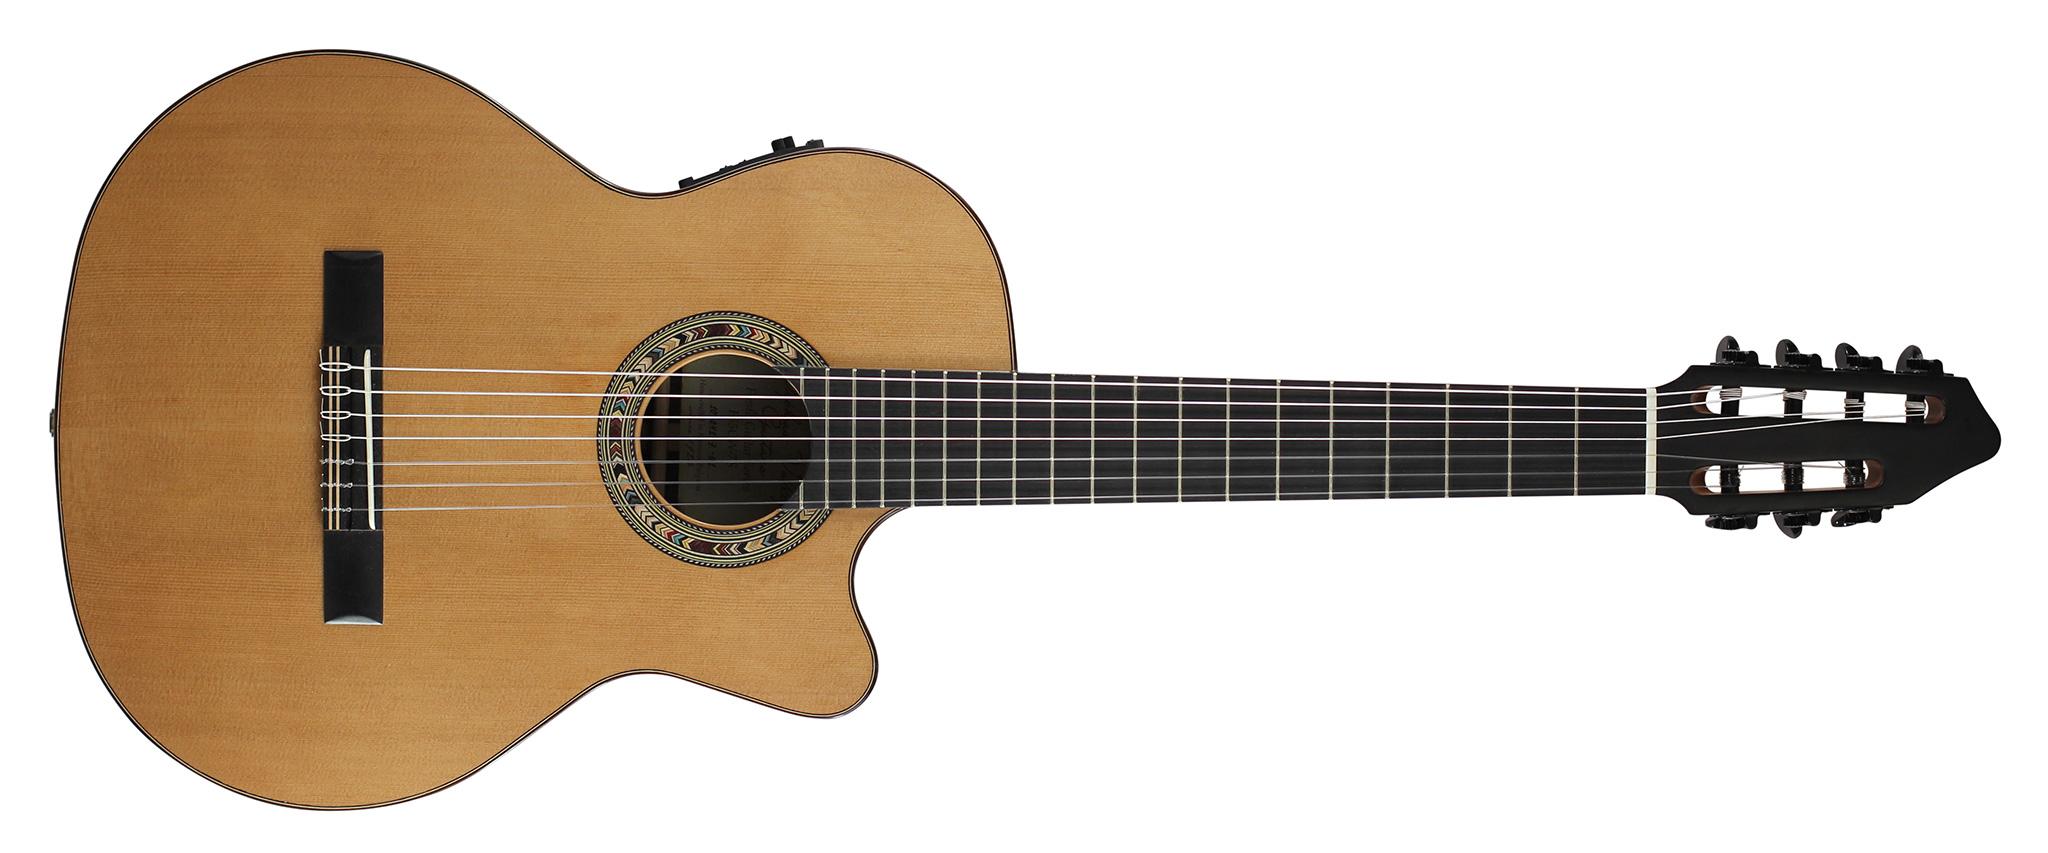 Kremona Performer Series F65 CW 7-String